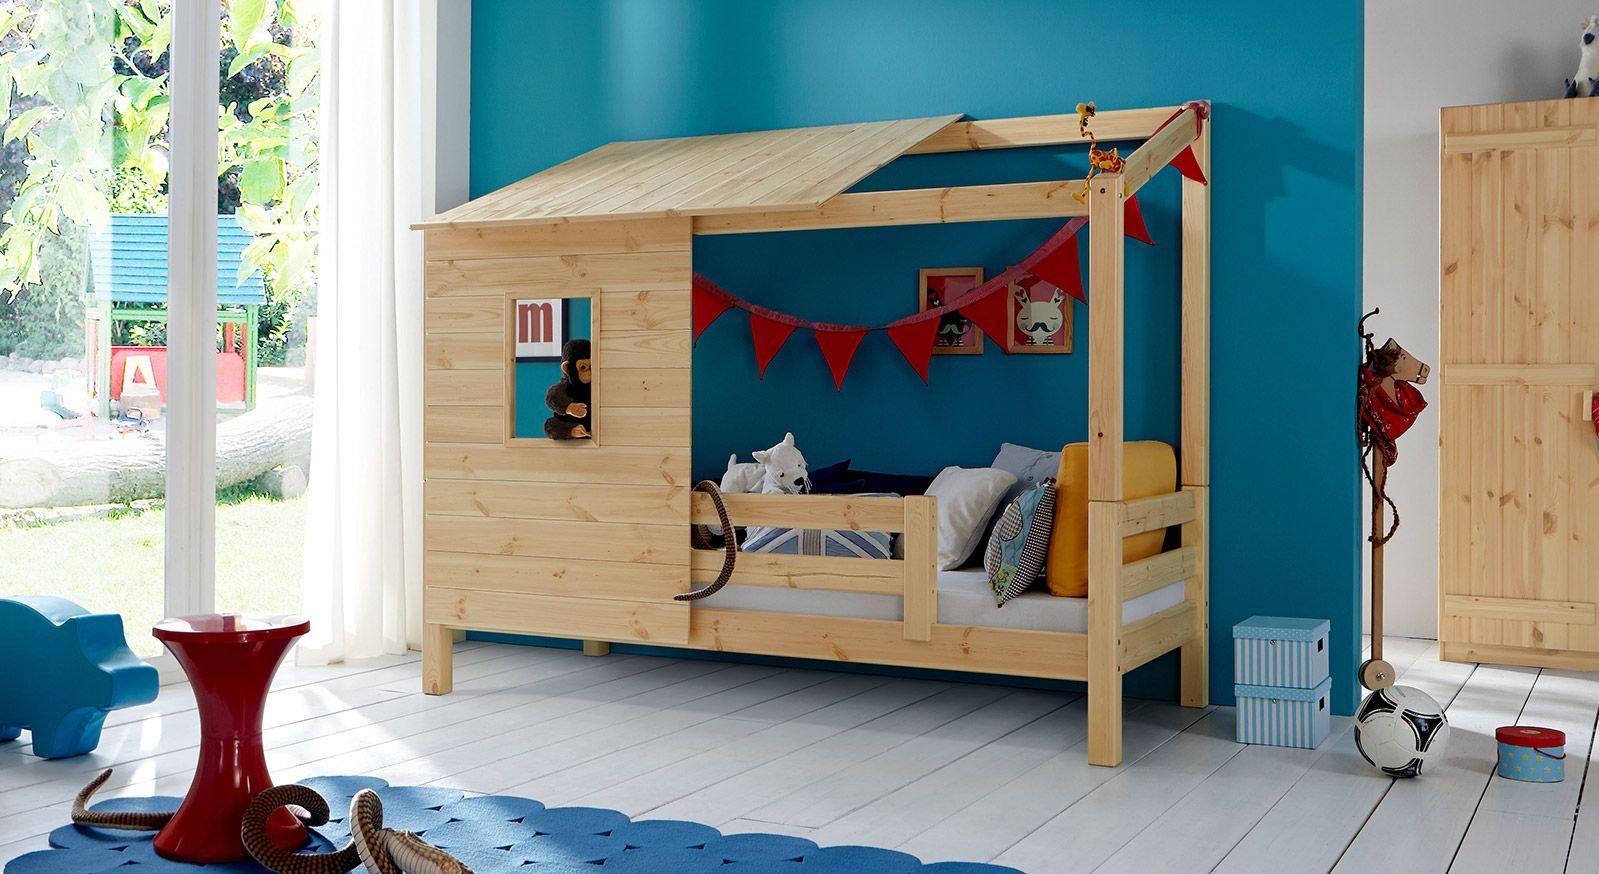 Abenteuerbett Kids Paradise aus Massivholz, Natur lackiert